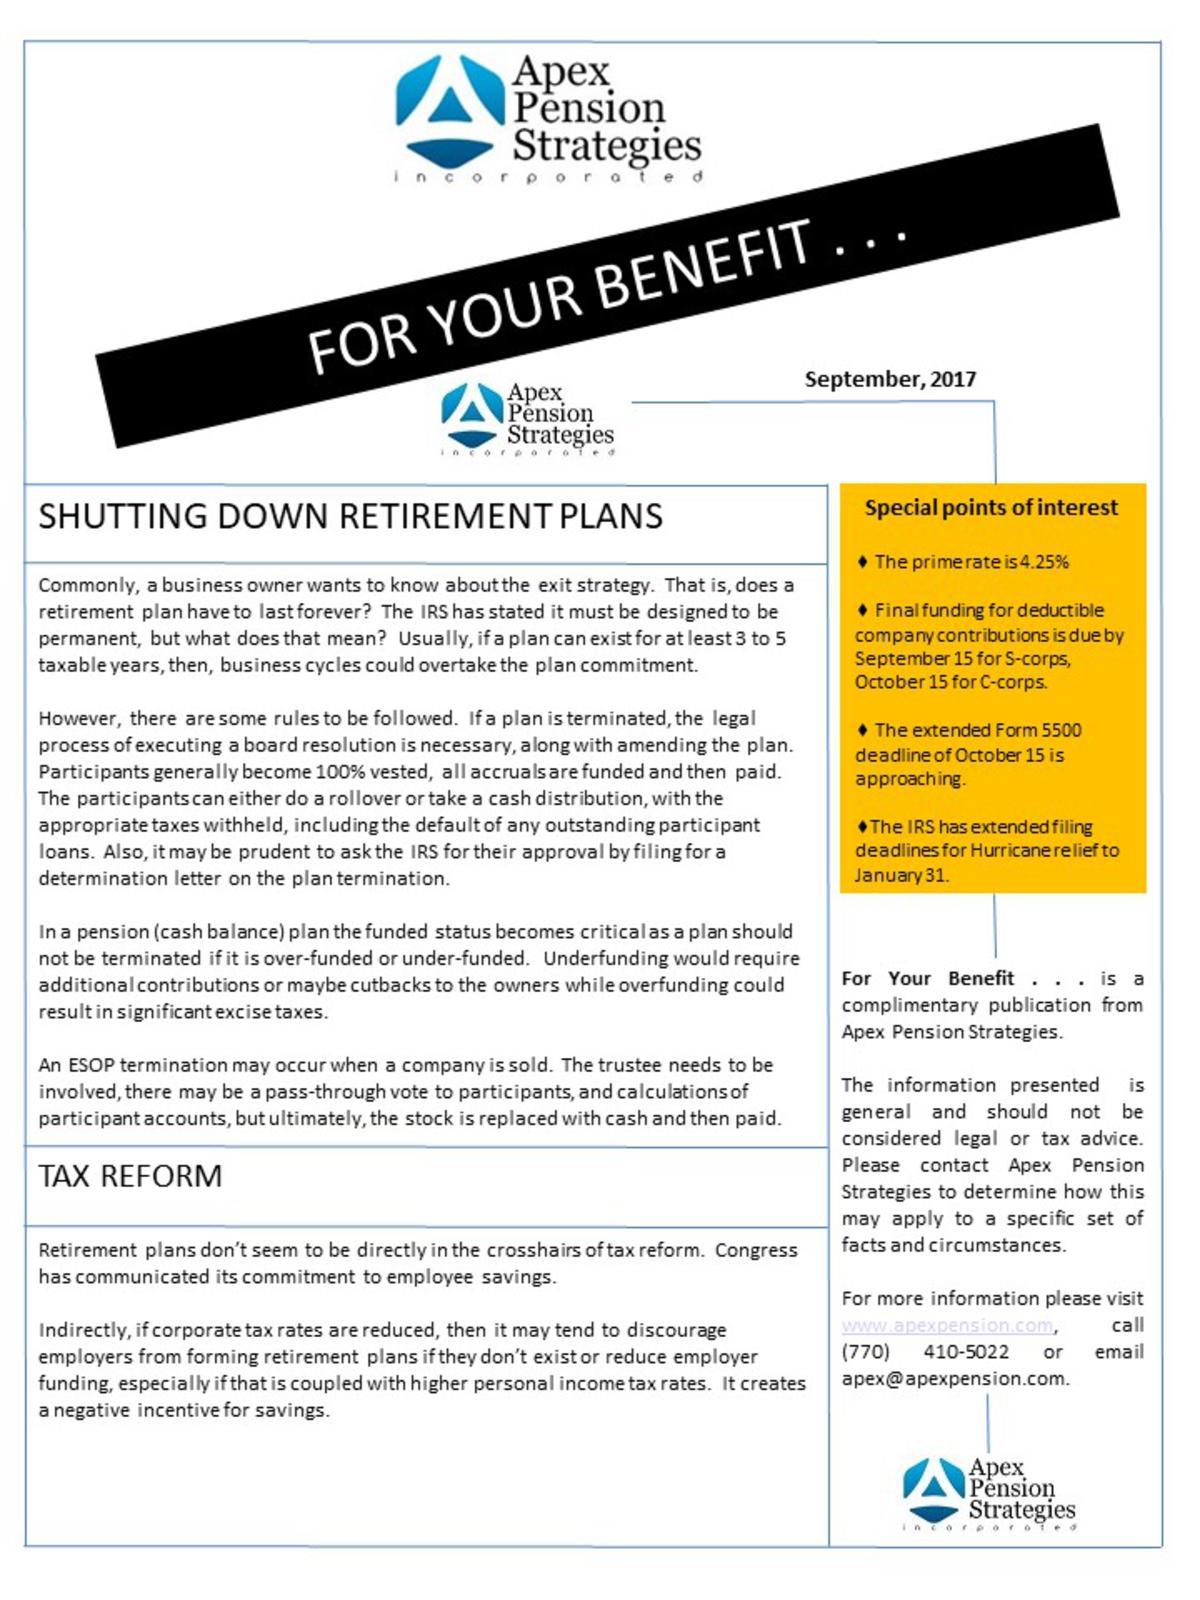 Shutting Down Retirement plans